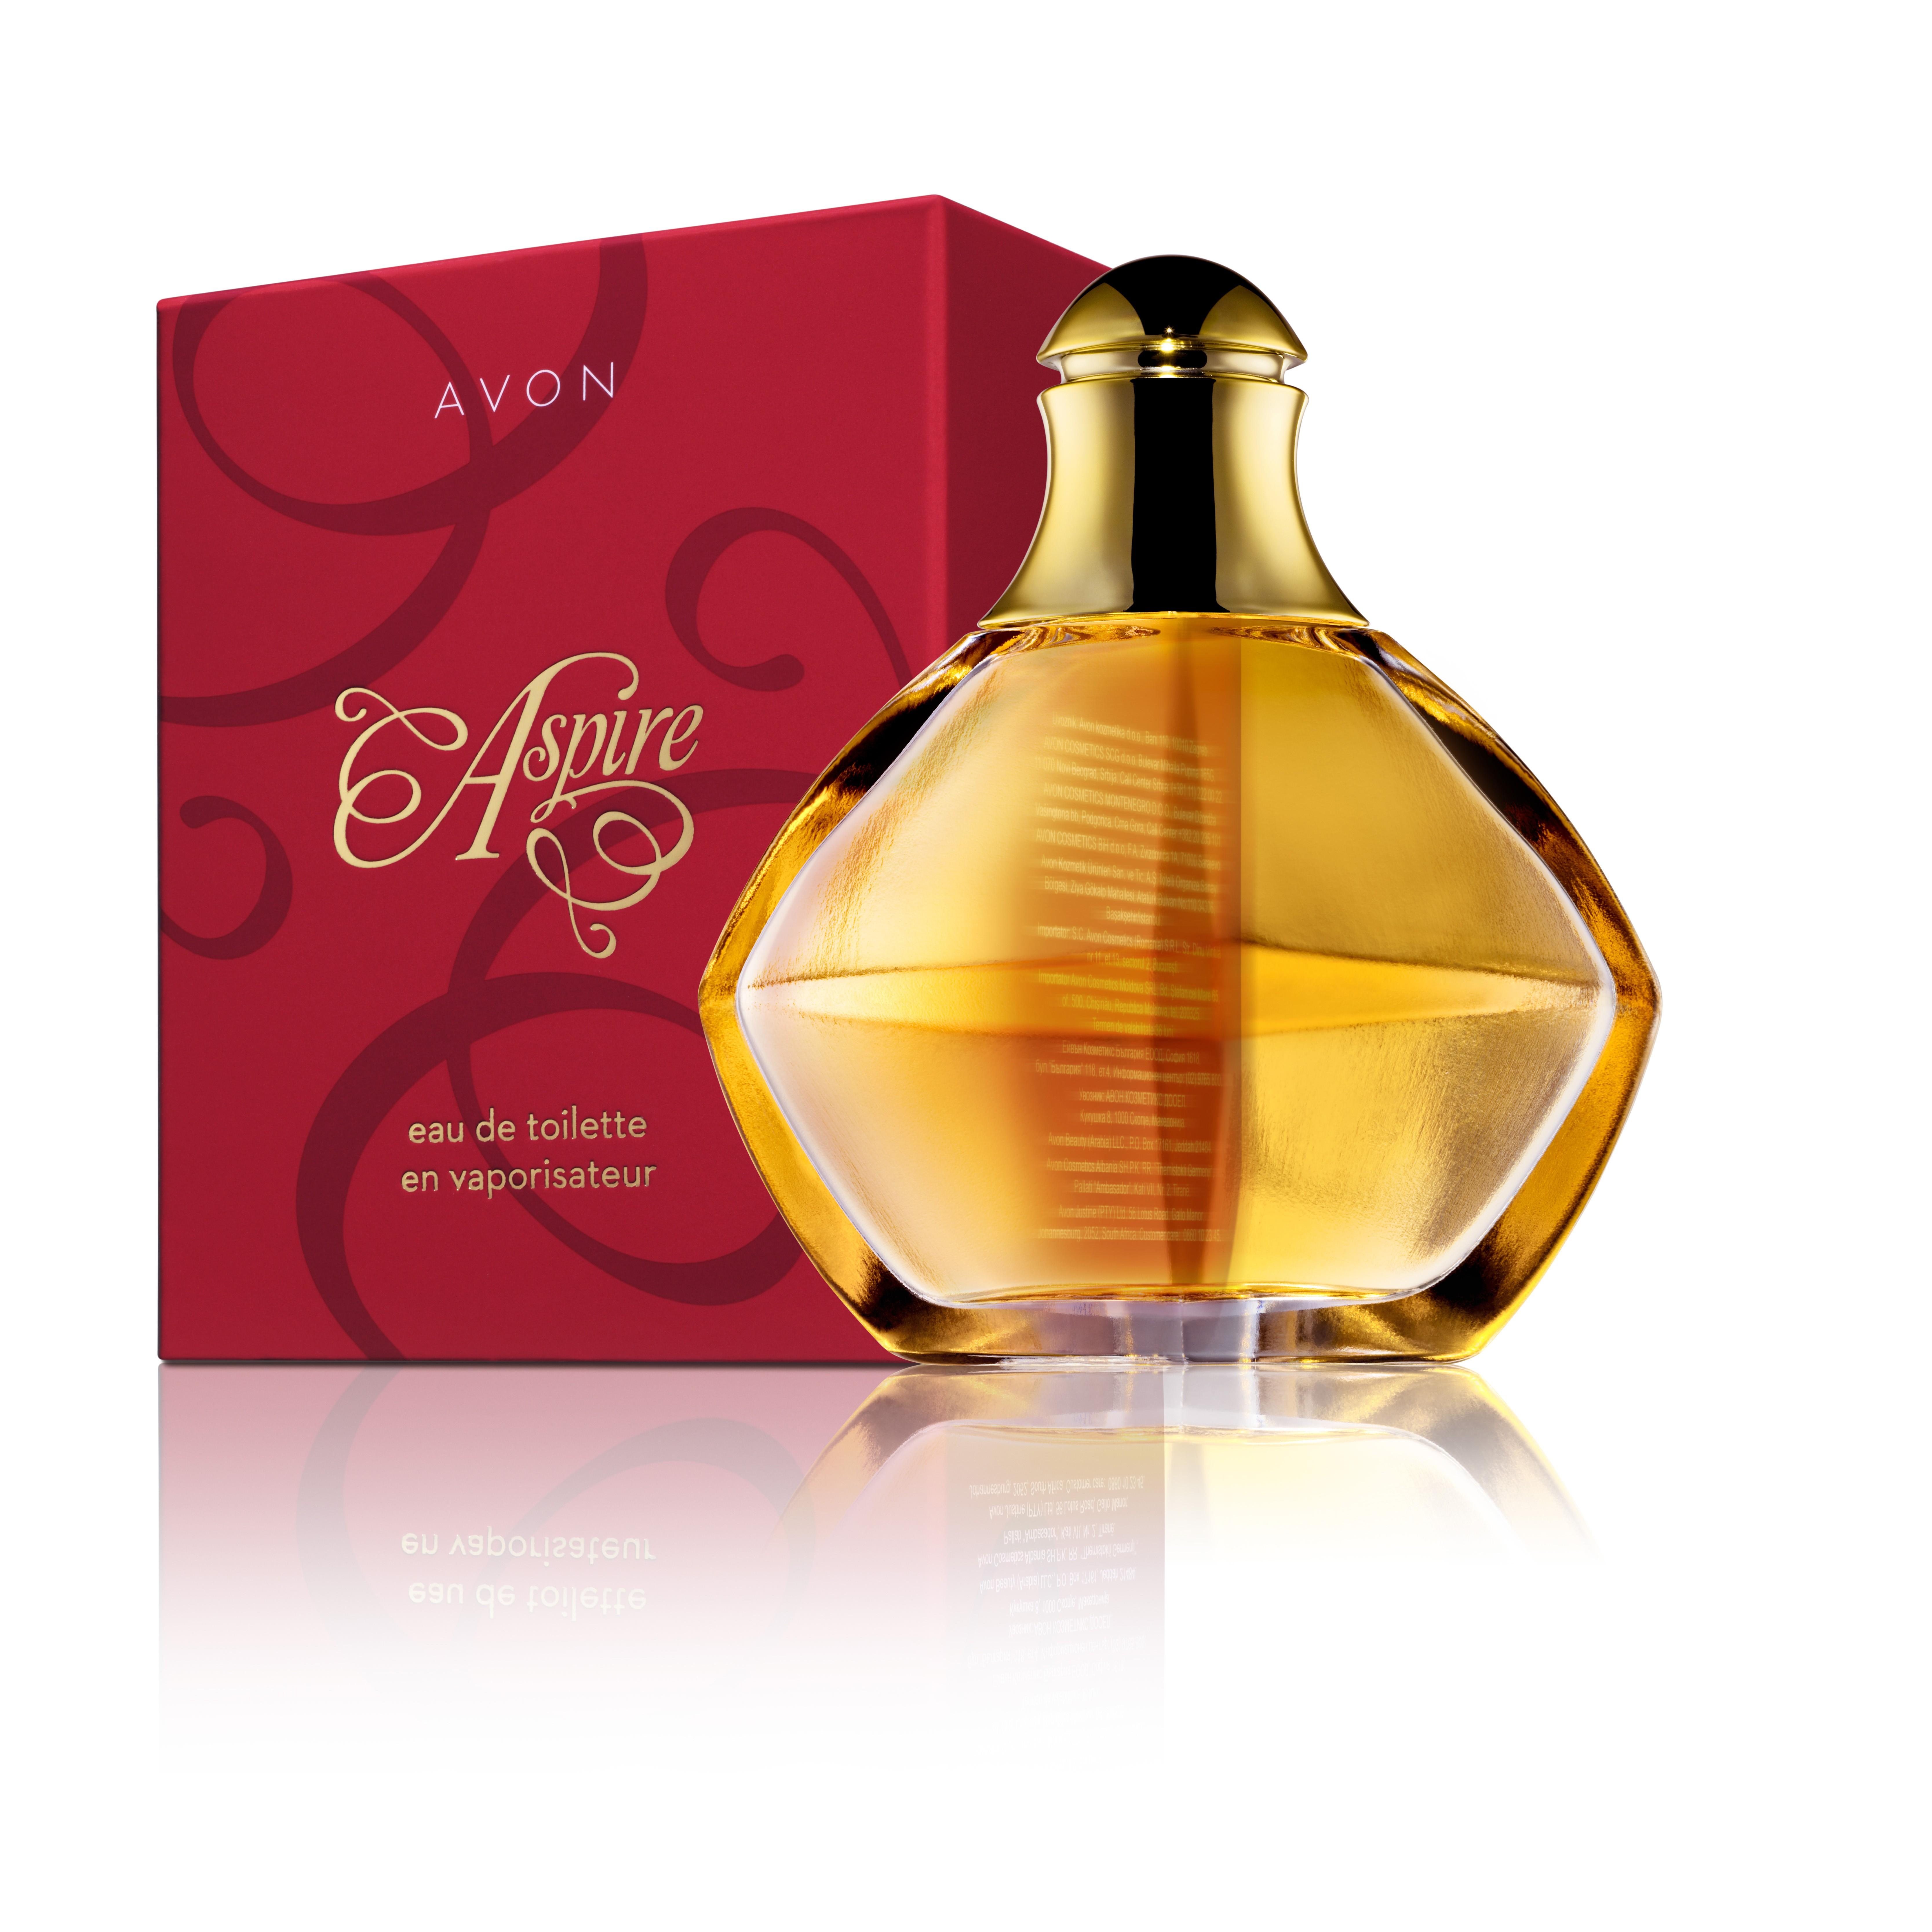 Avon Aspire аромат для женщин